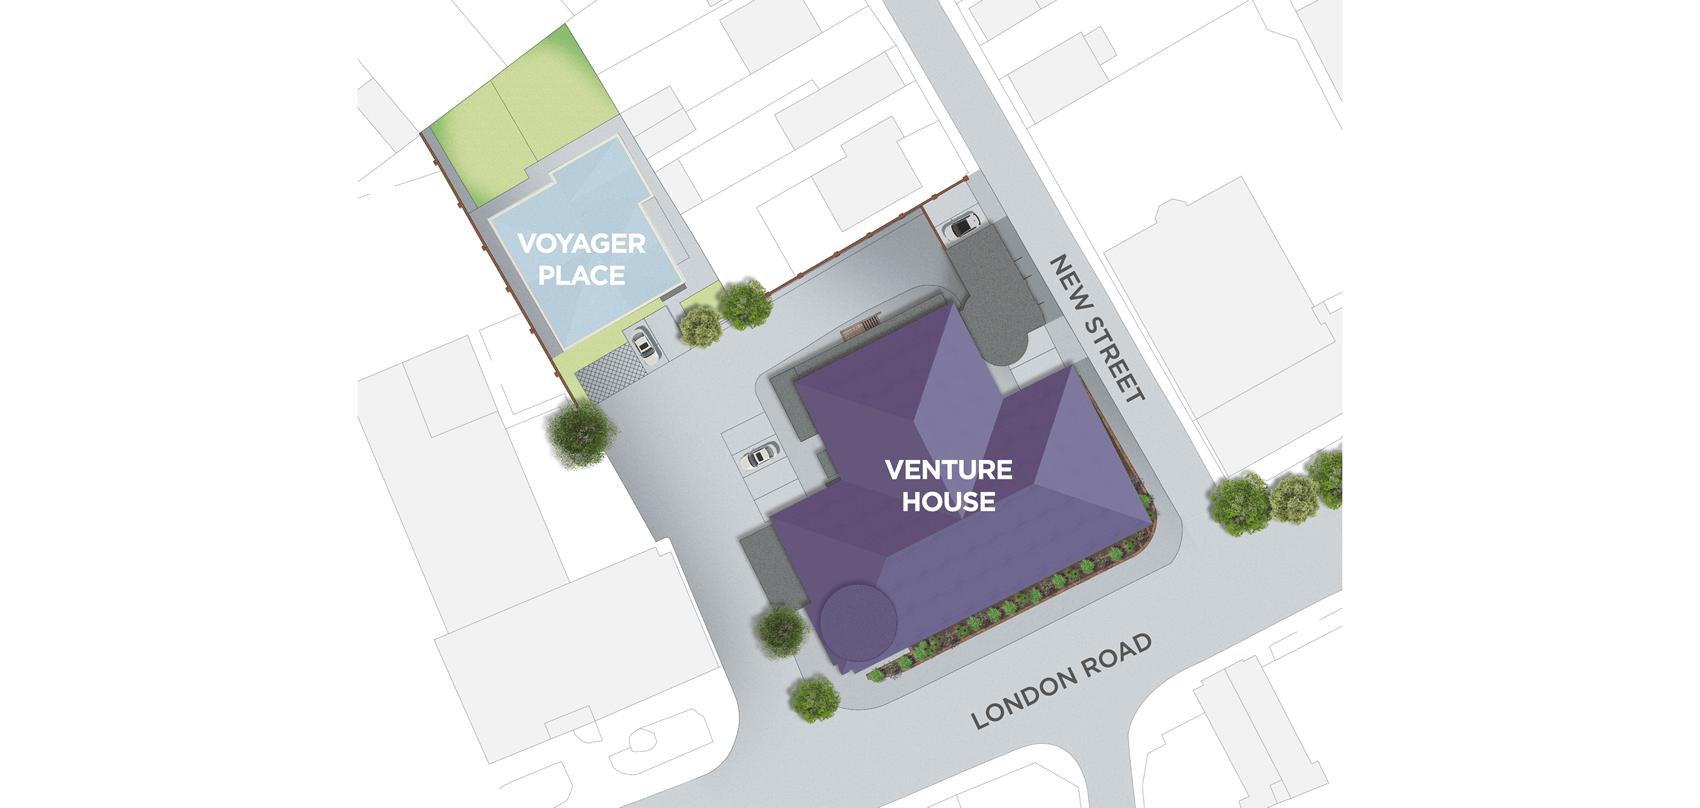 Venture House Siteplan